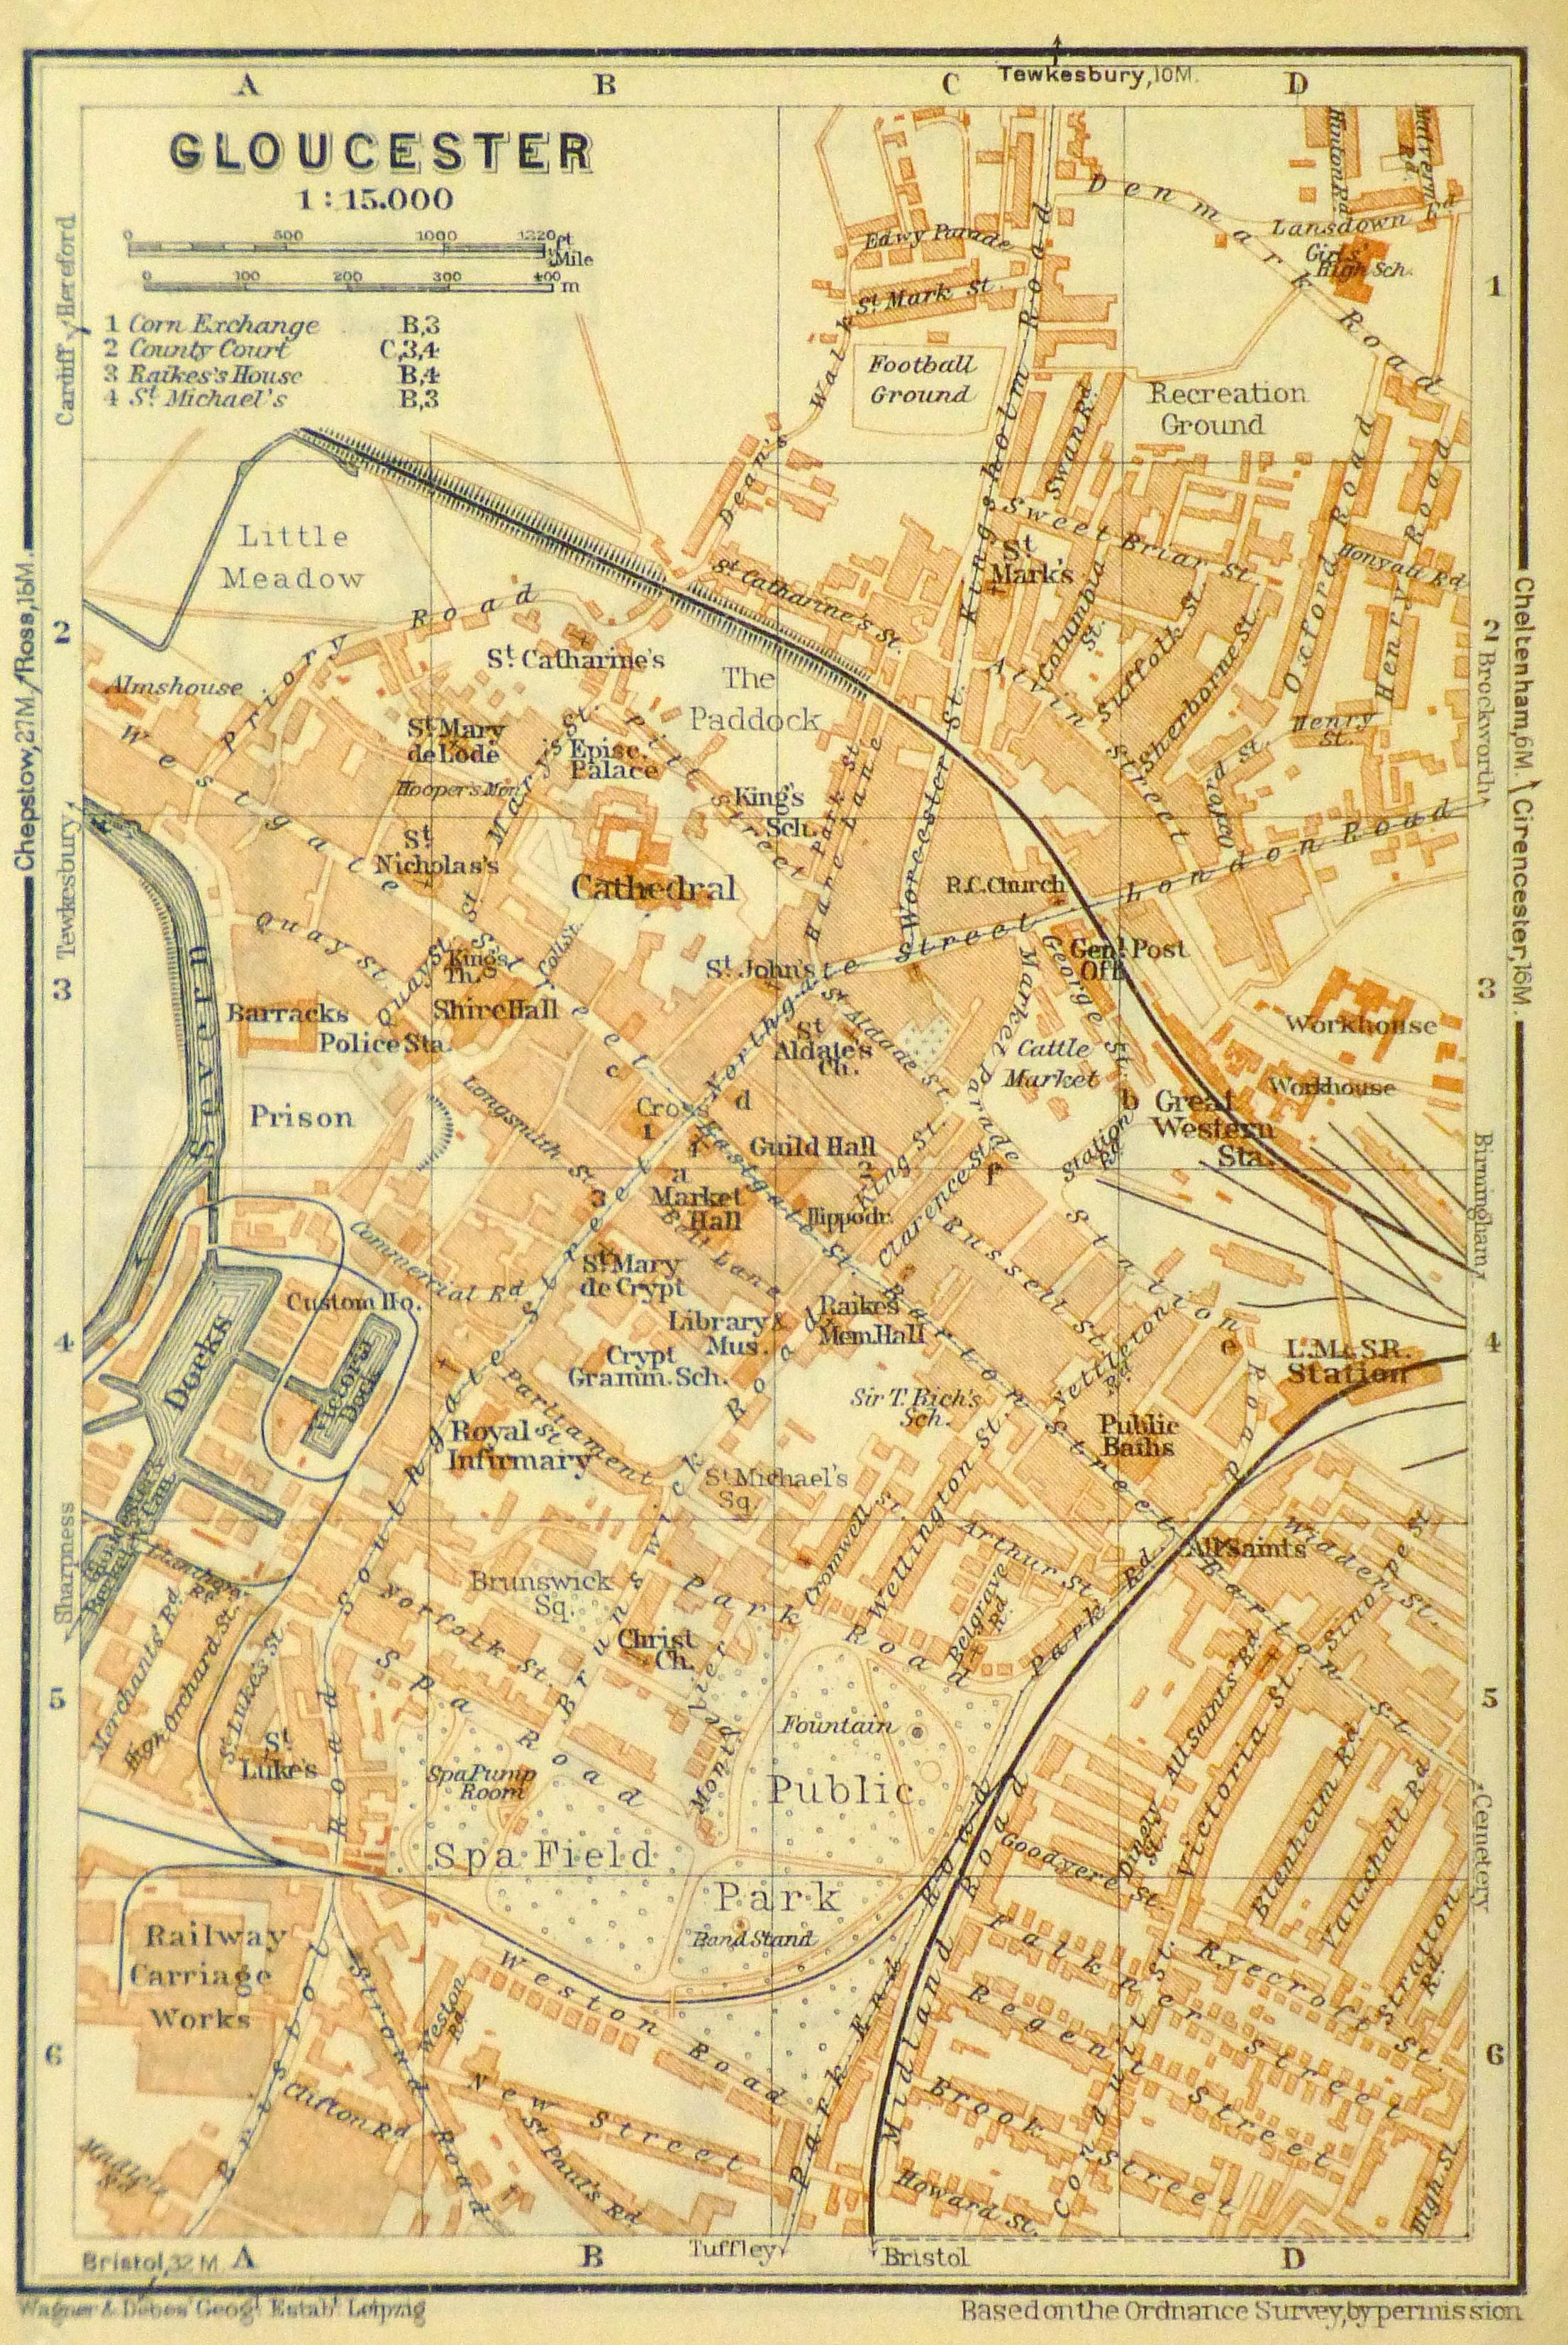 Map Of England 200.Gloucester England Map 1927 Original Art Antique Maps Prints